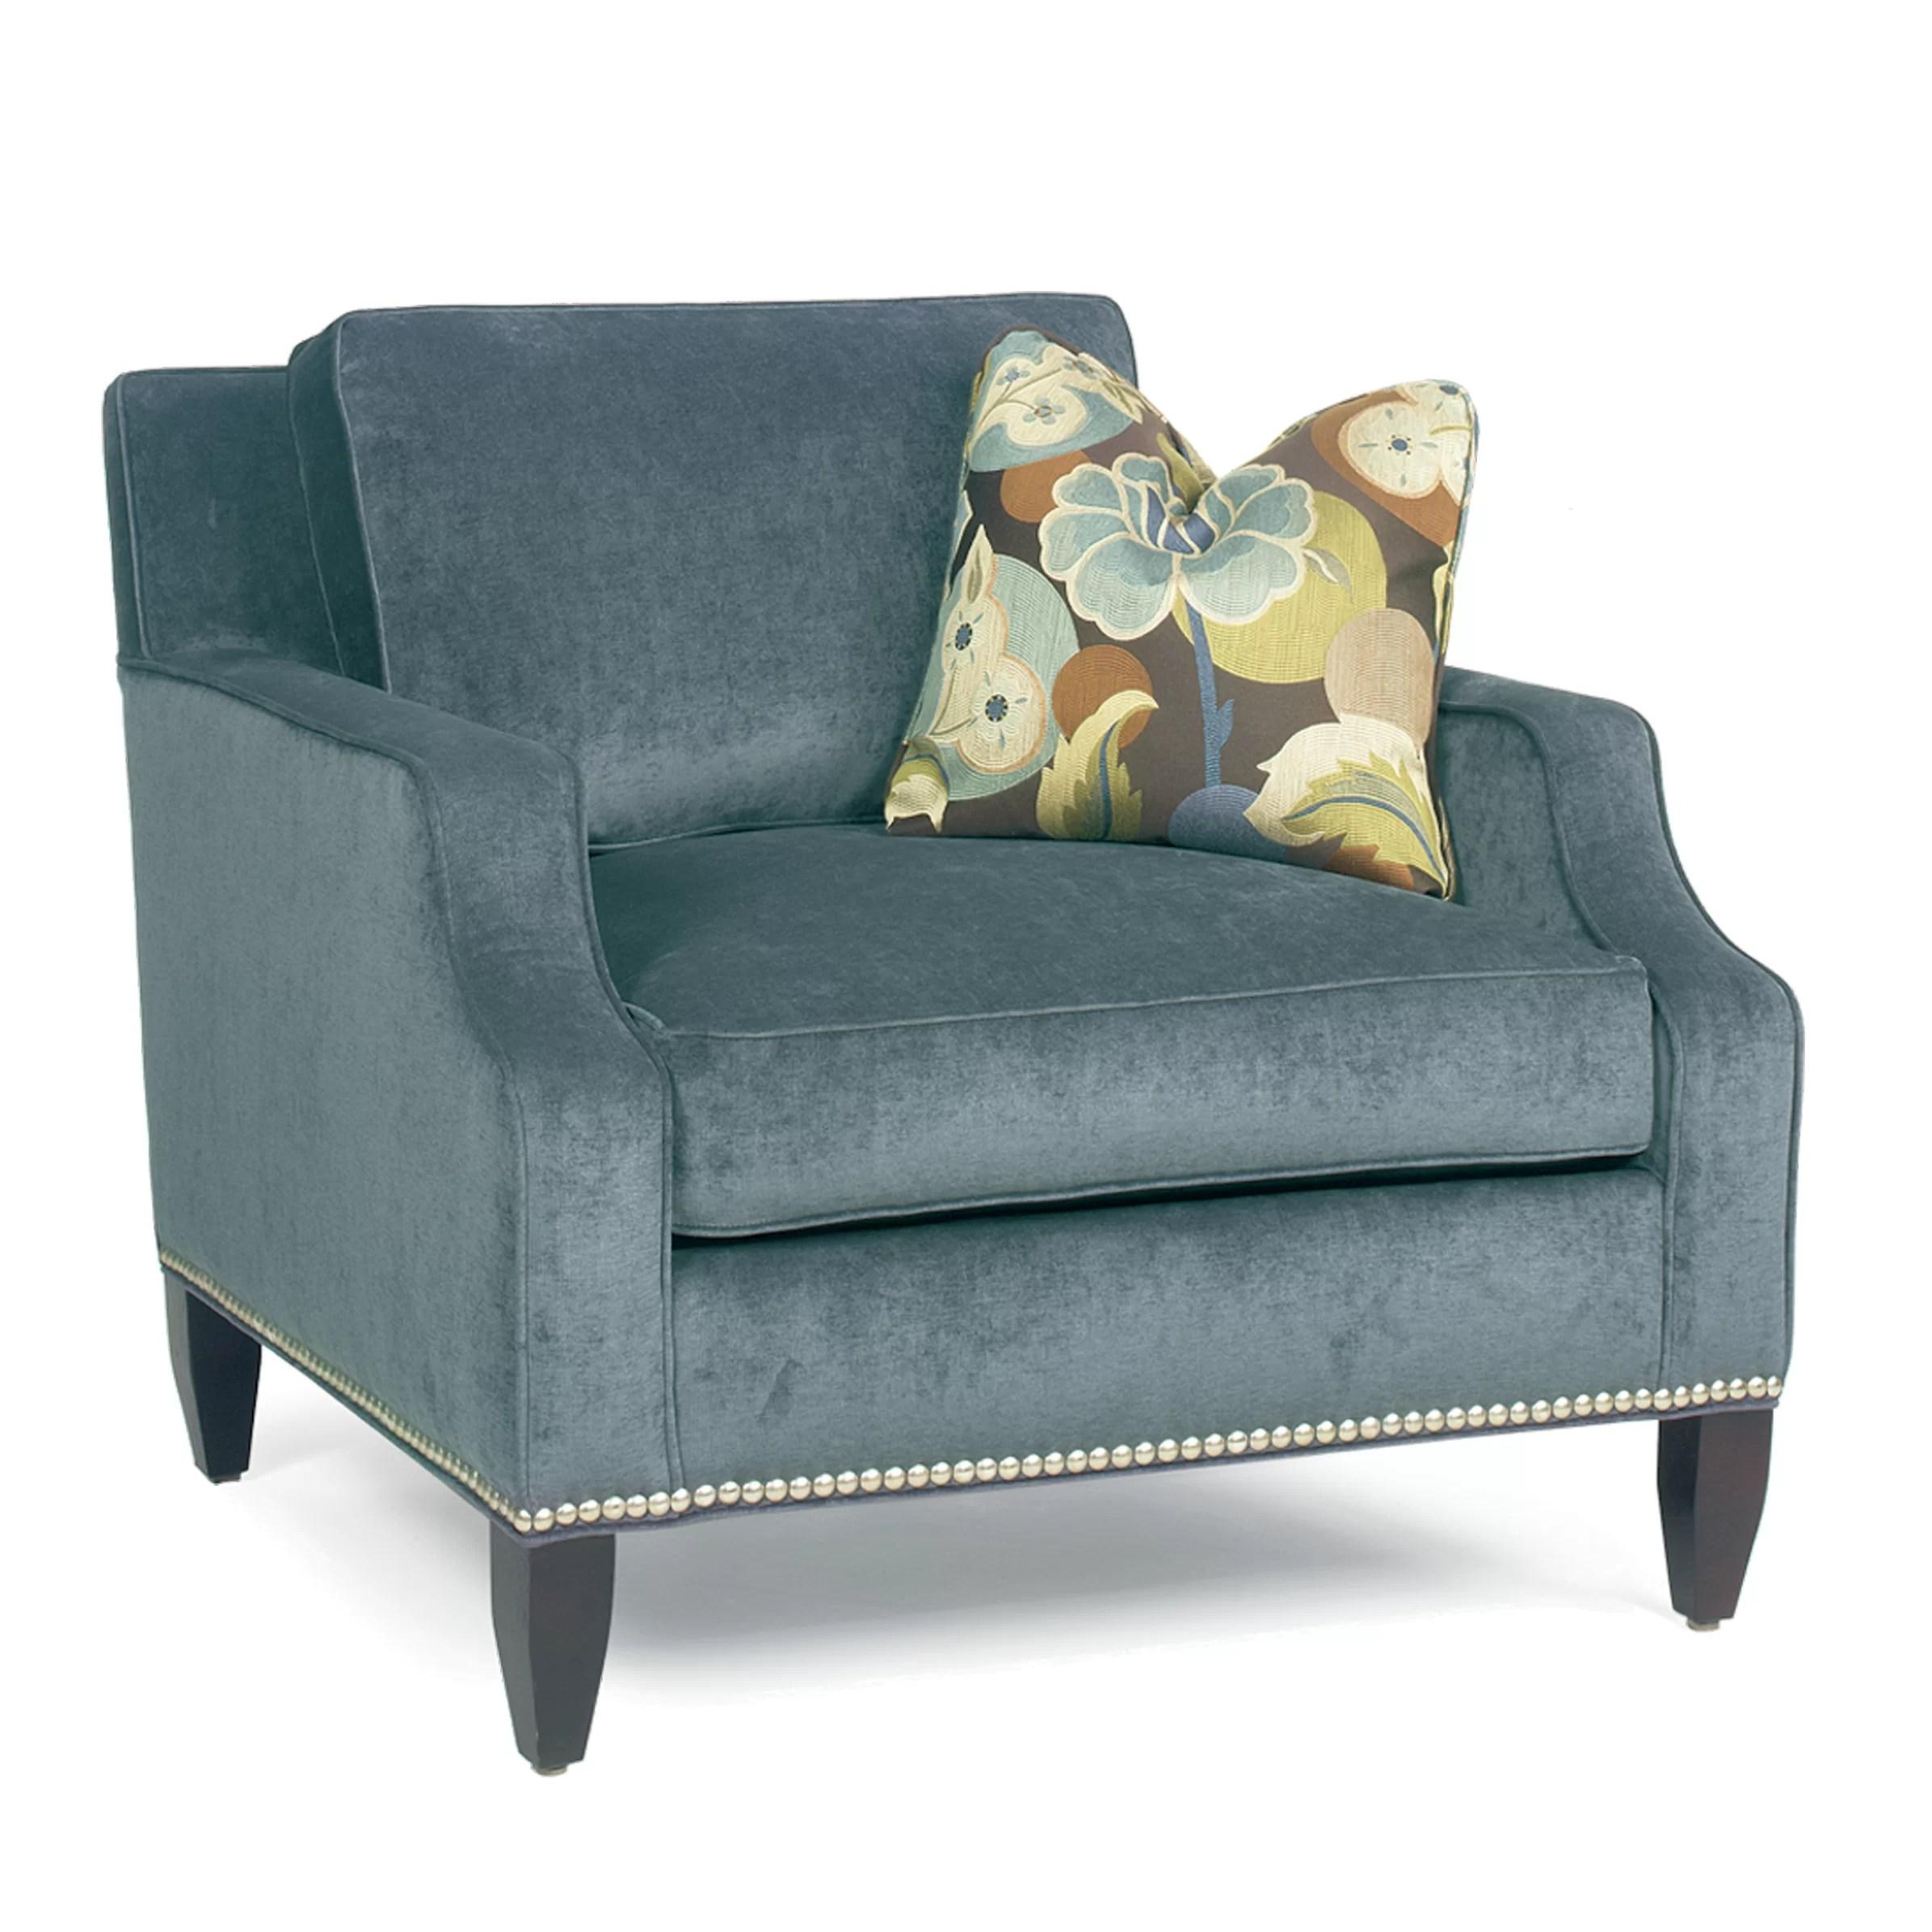 armchair pillow heavy duty plastic adirondack chairs classic comfort modern notch arm loose back club